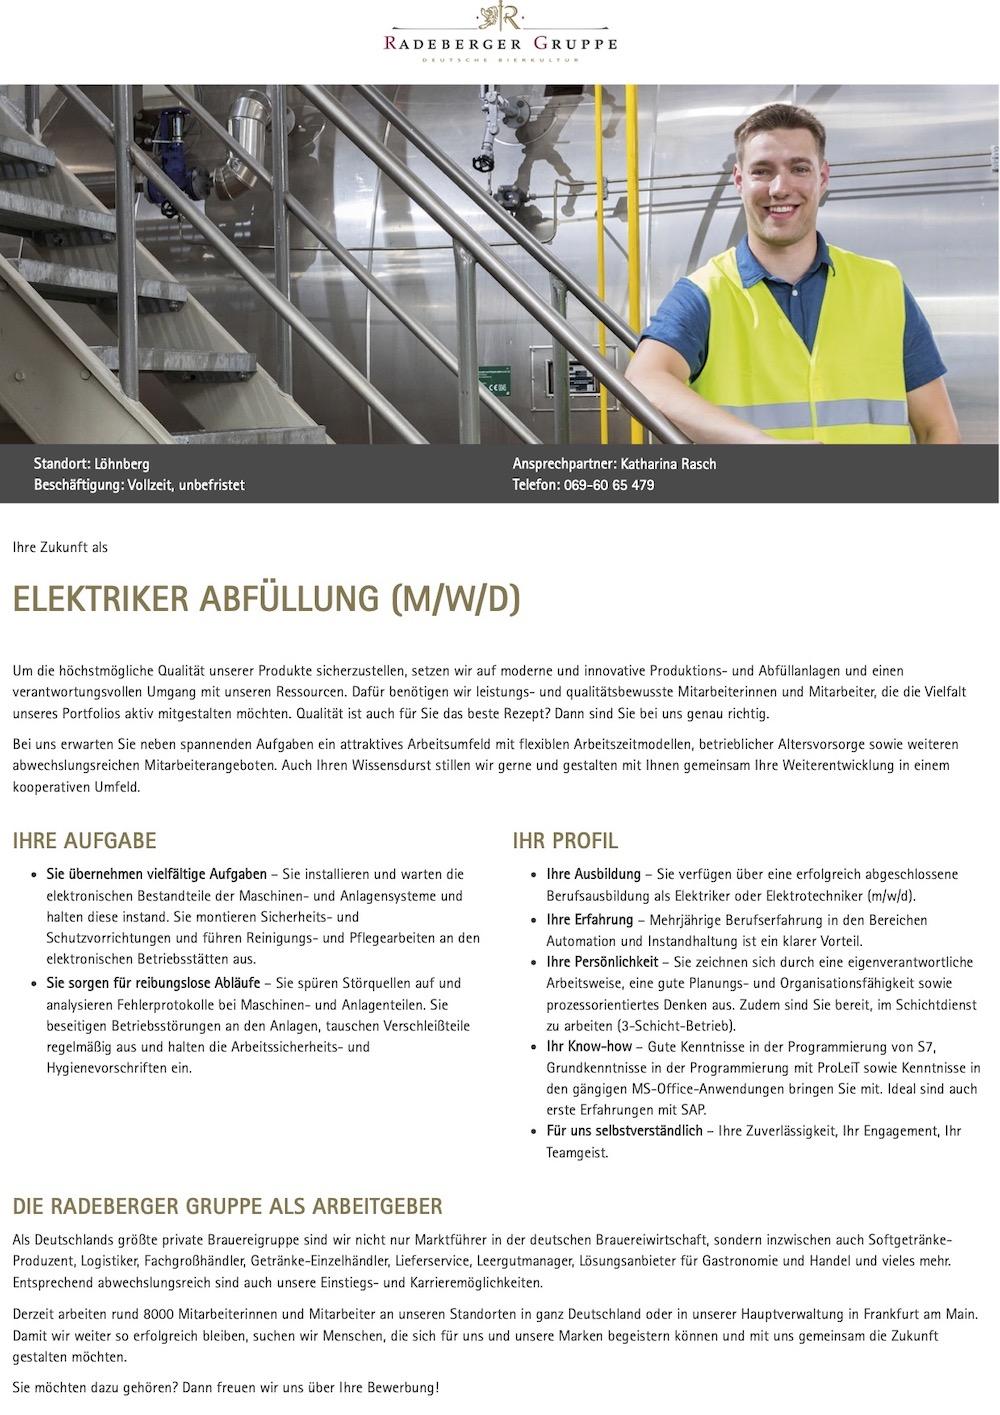 Elektriker Abfüllung (m/w/d) - Vollzeit, unbefristet